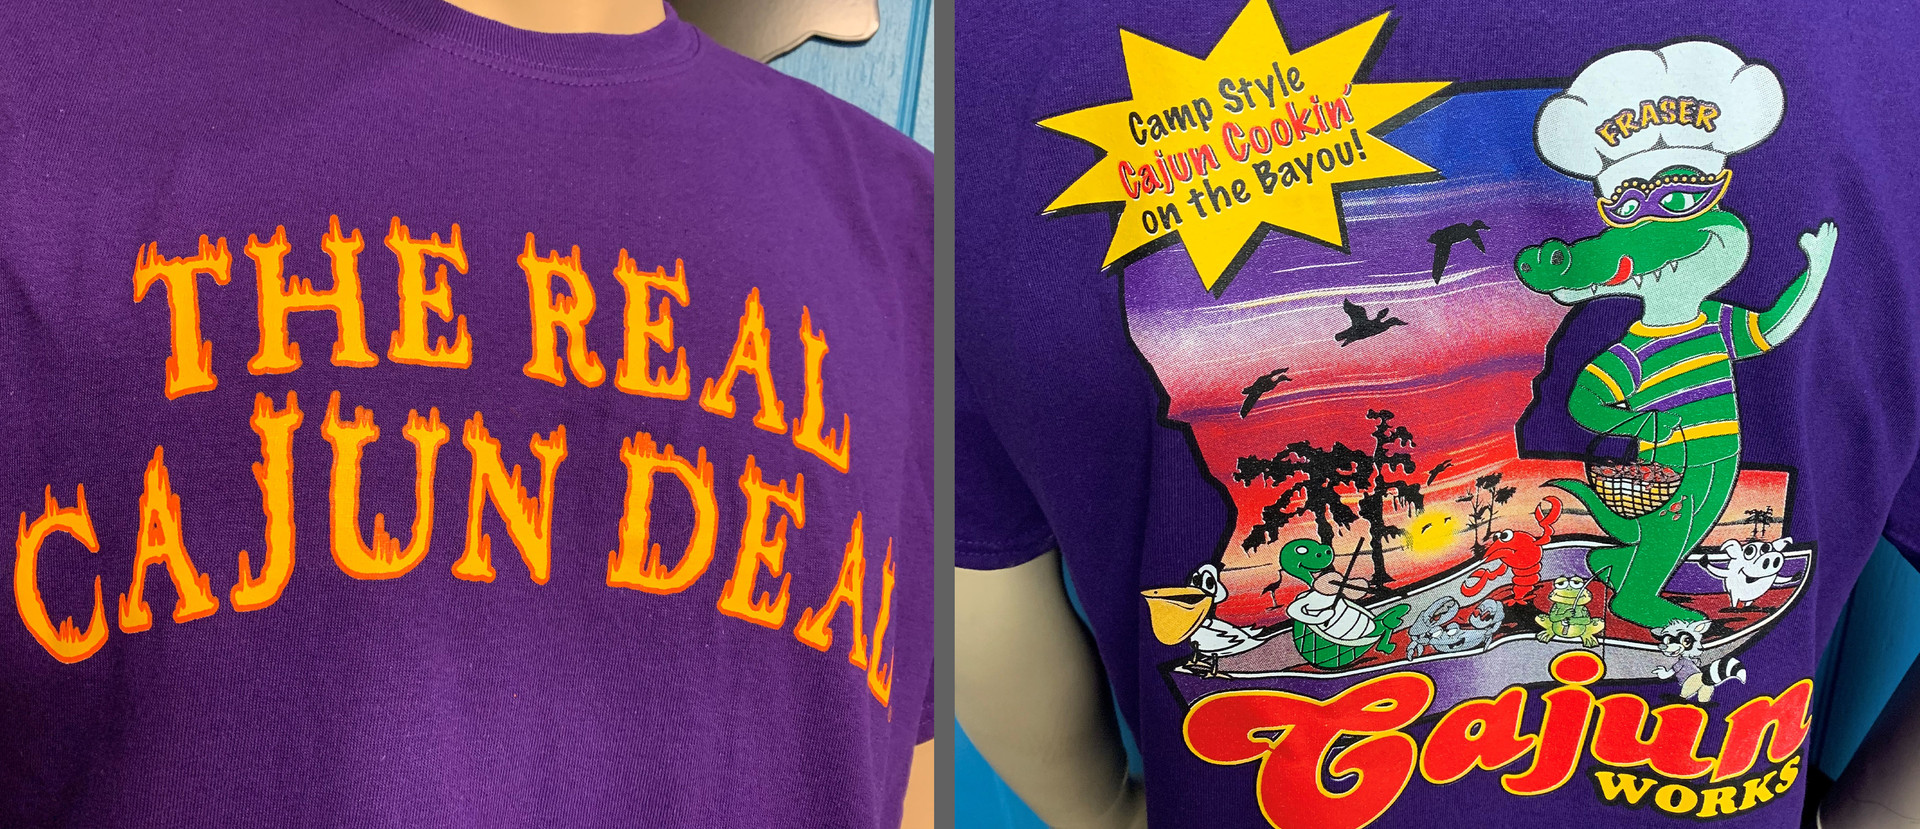 The Real Cajun Deal-4.jpg